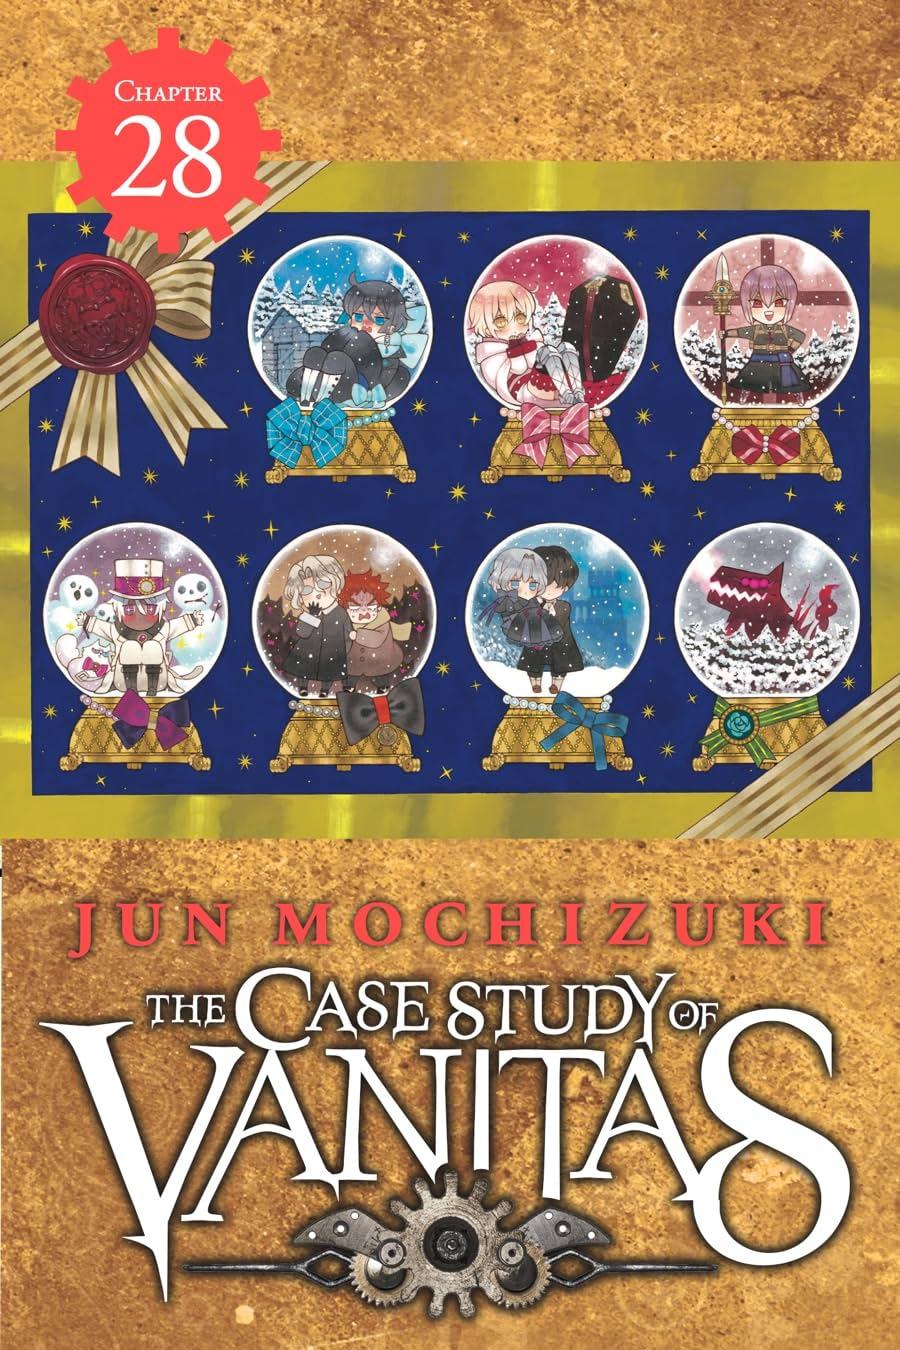 The Case Study of Vanitas #28